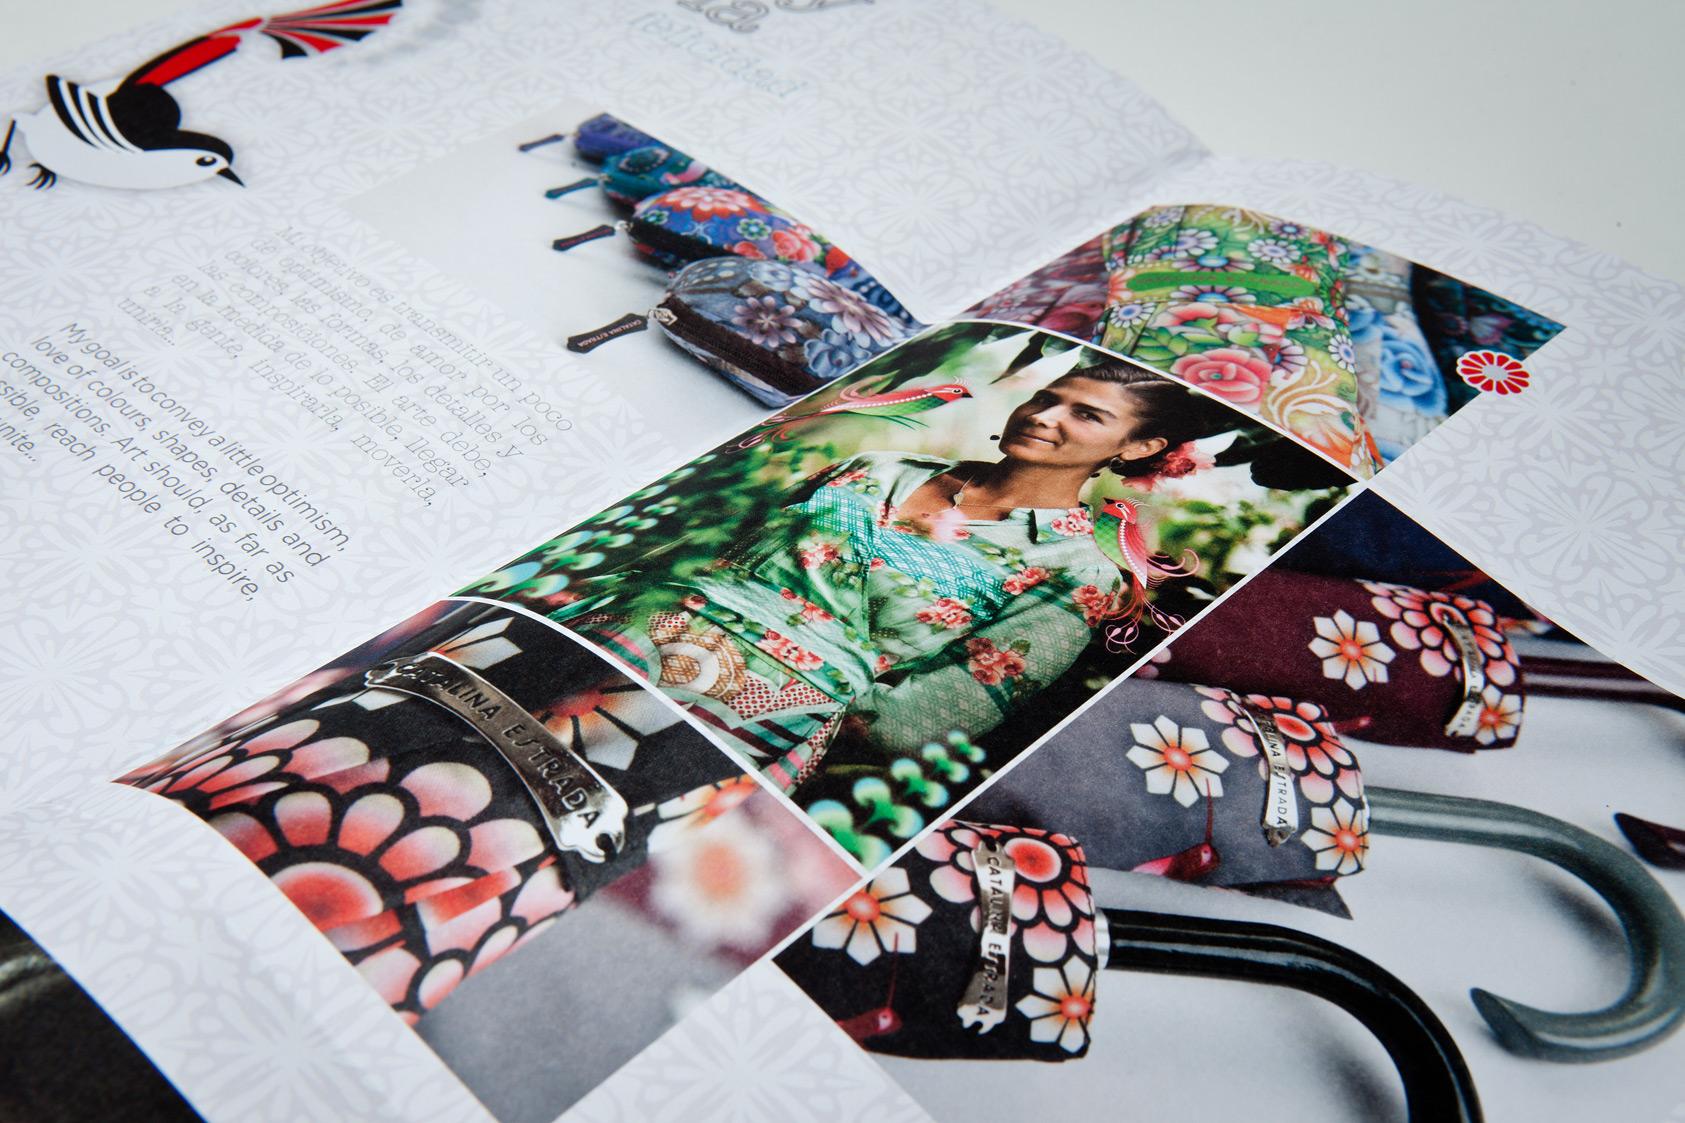 lombok_design_marketing_blog_ezpeleta_catalogos_5